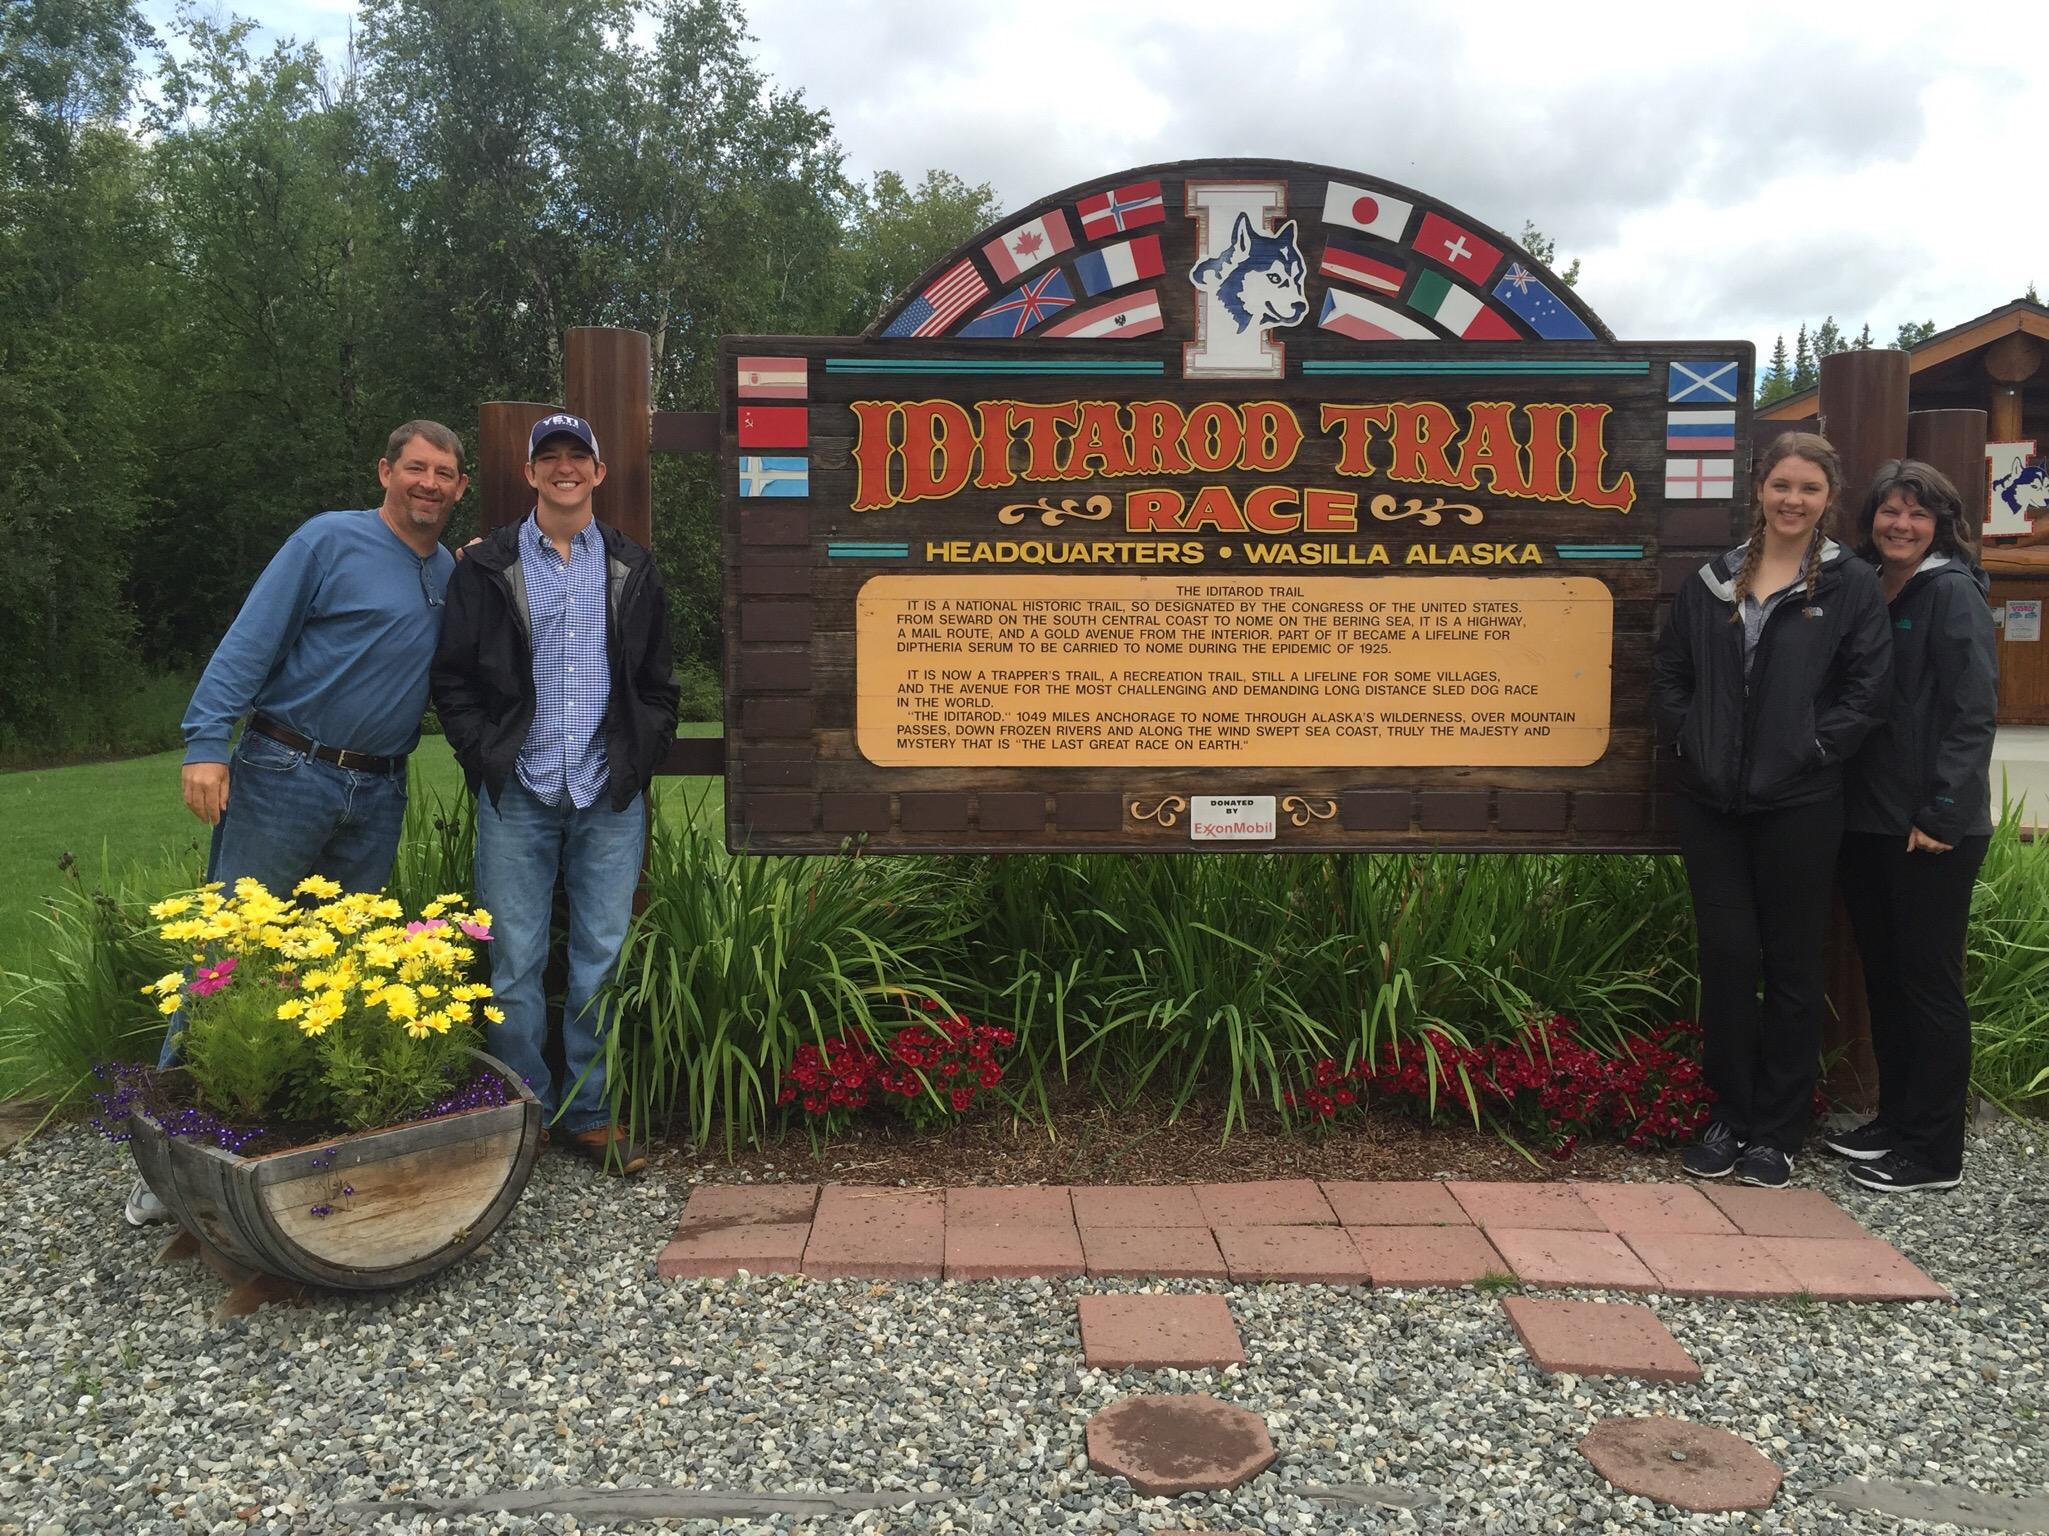 Iditarod trail family pic.JPG